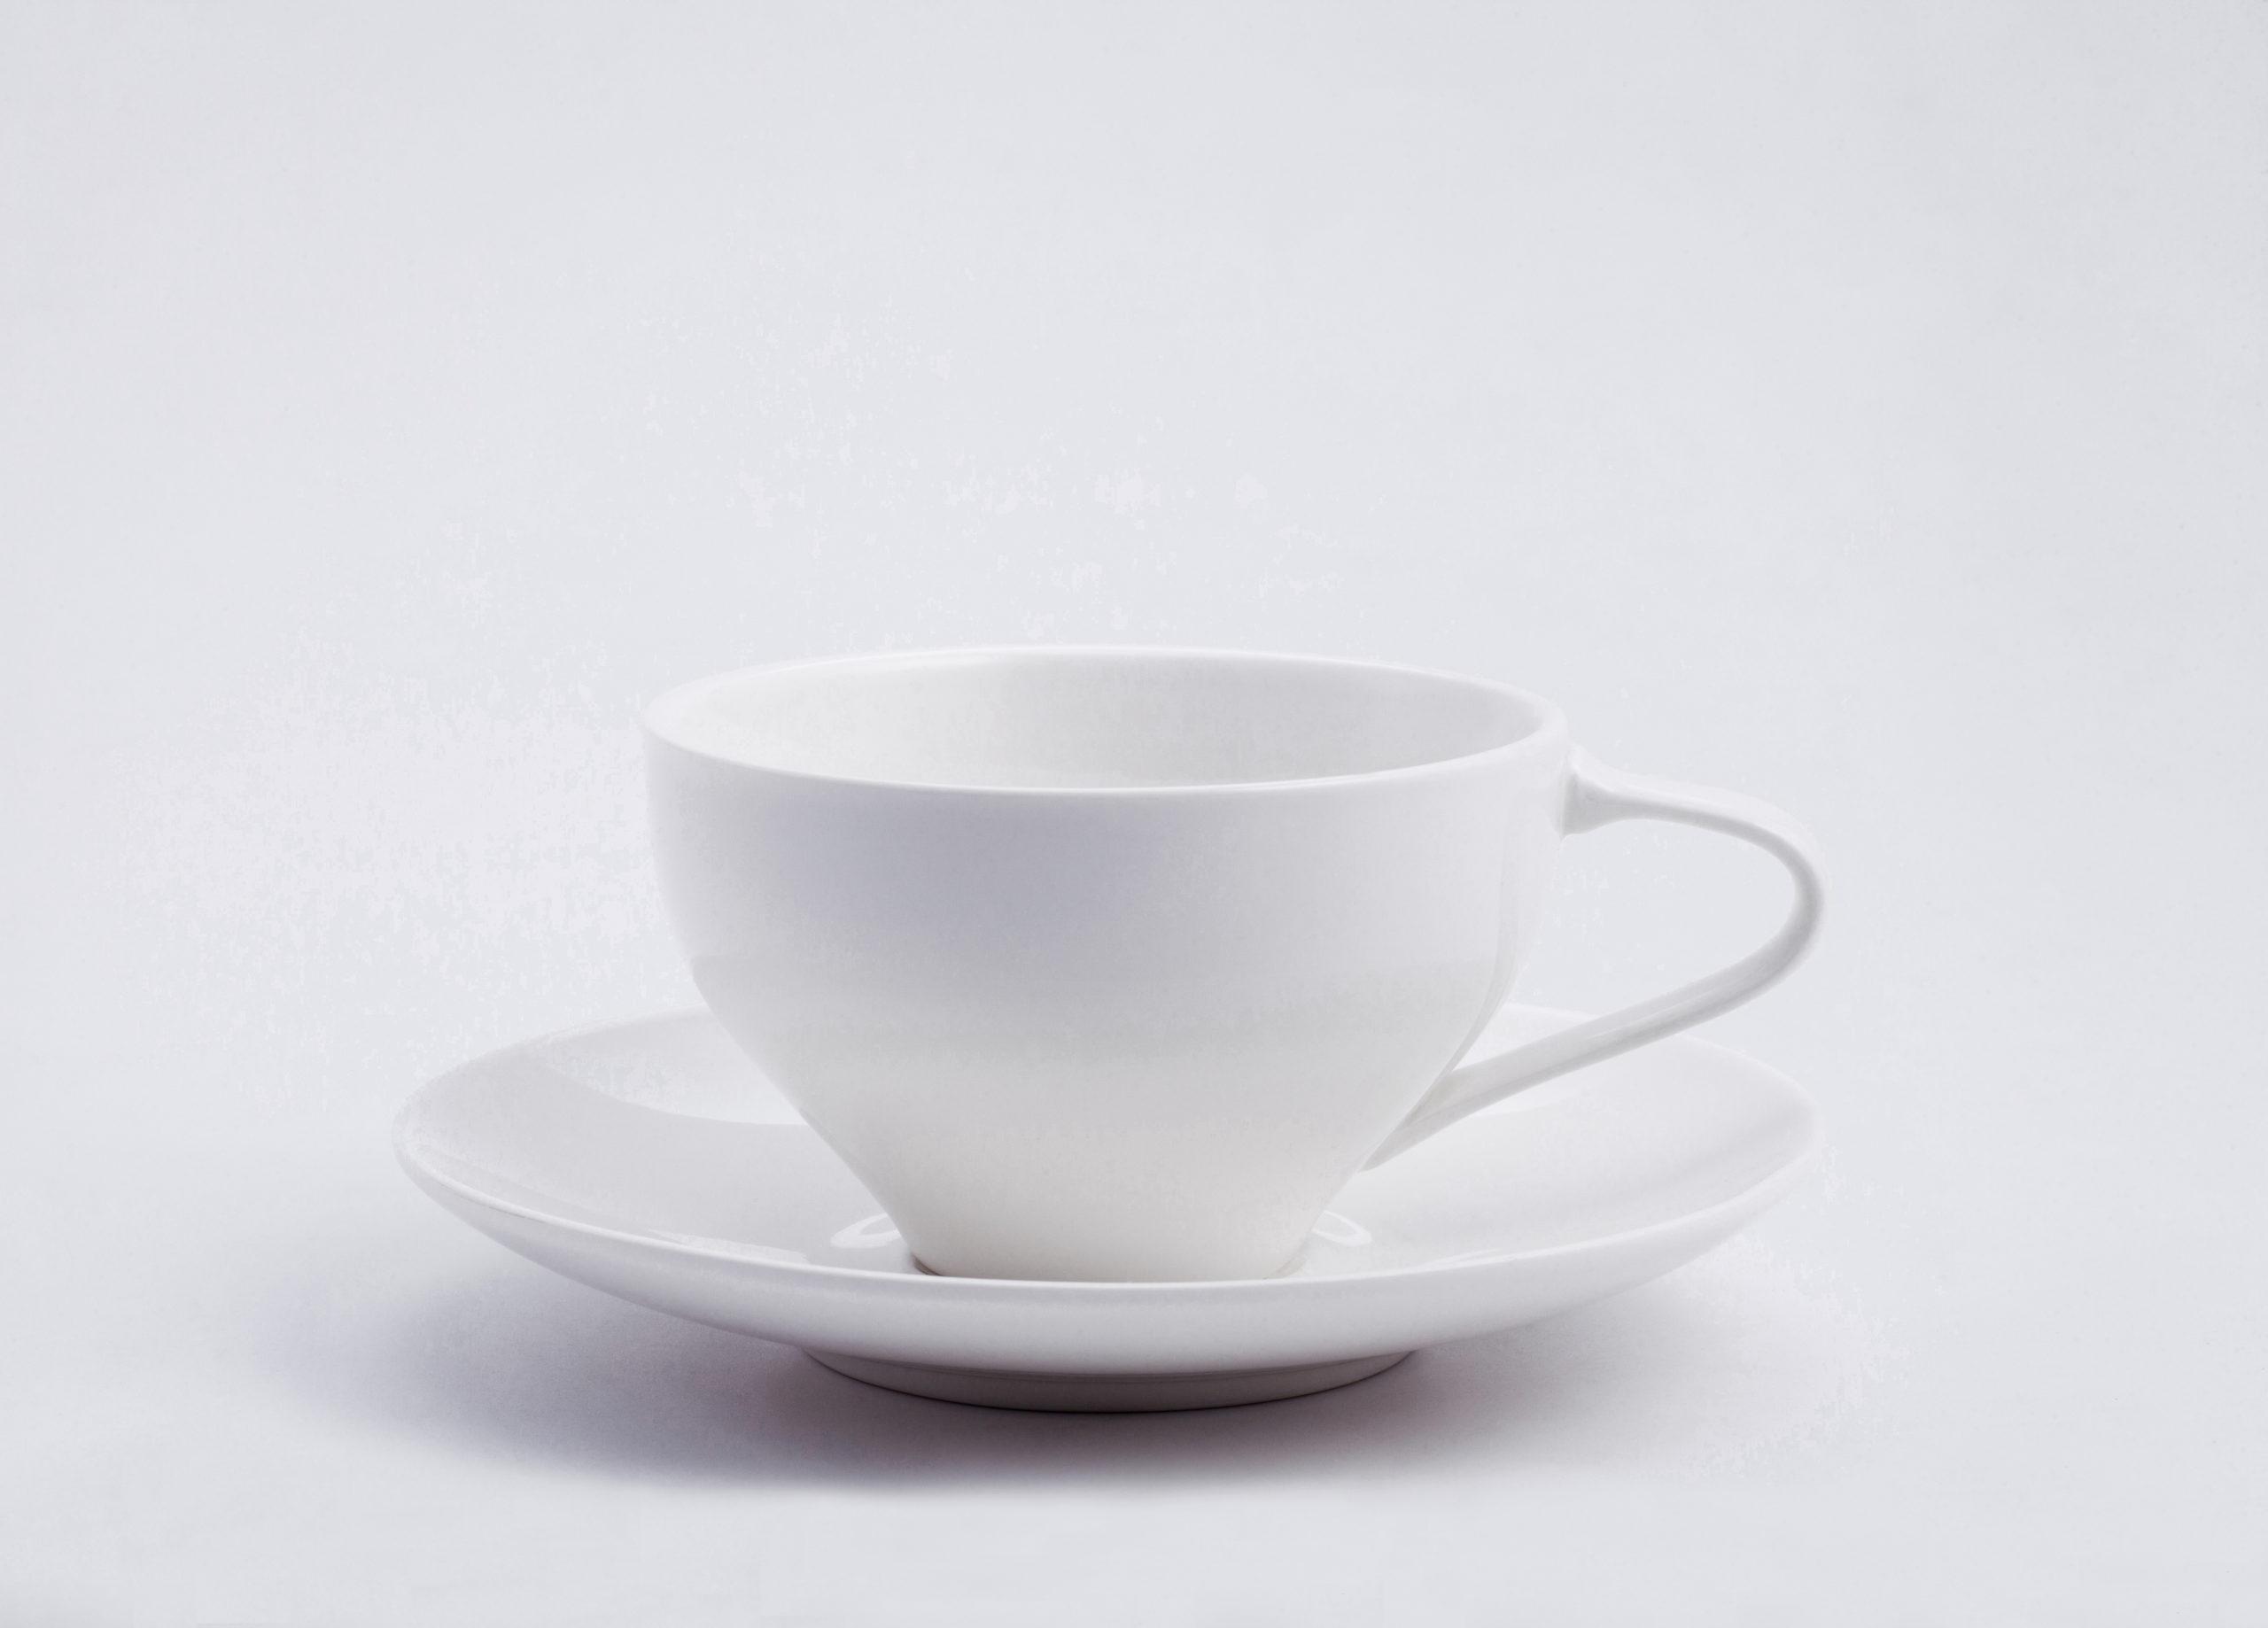 Architectmade-FJ-Essence-Teacup-And-Saucer-Porcelain-Finn-Juhl